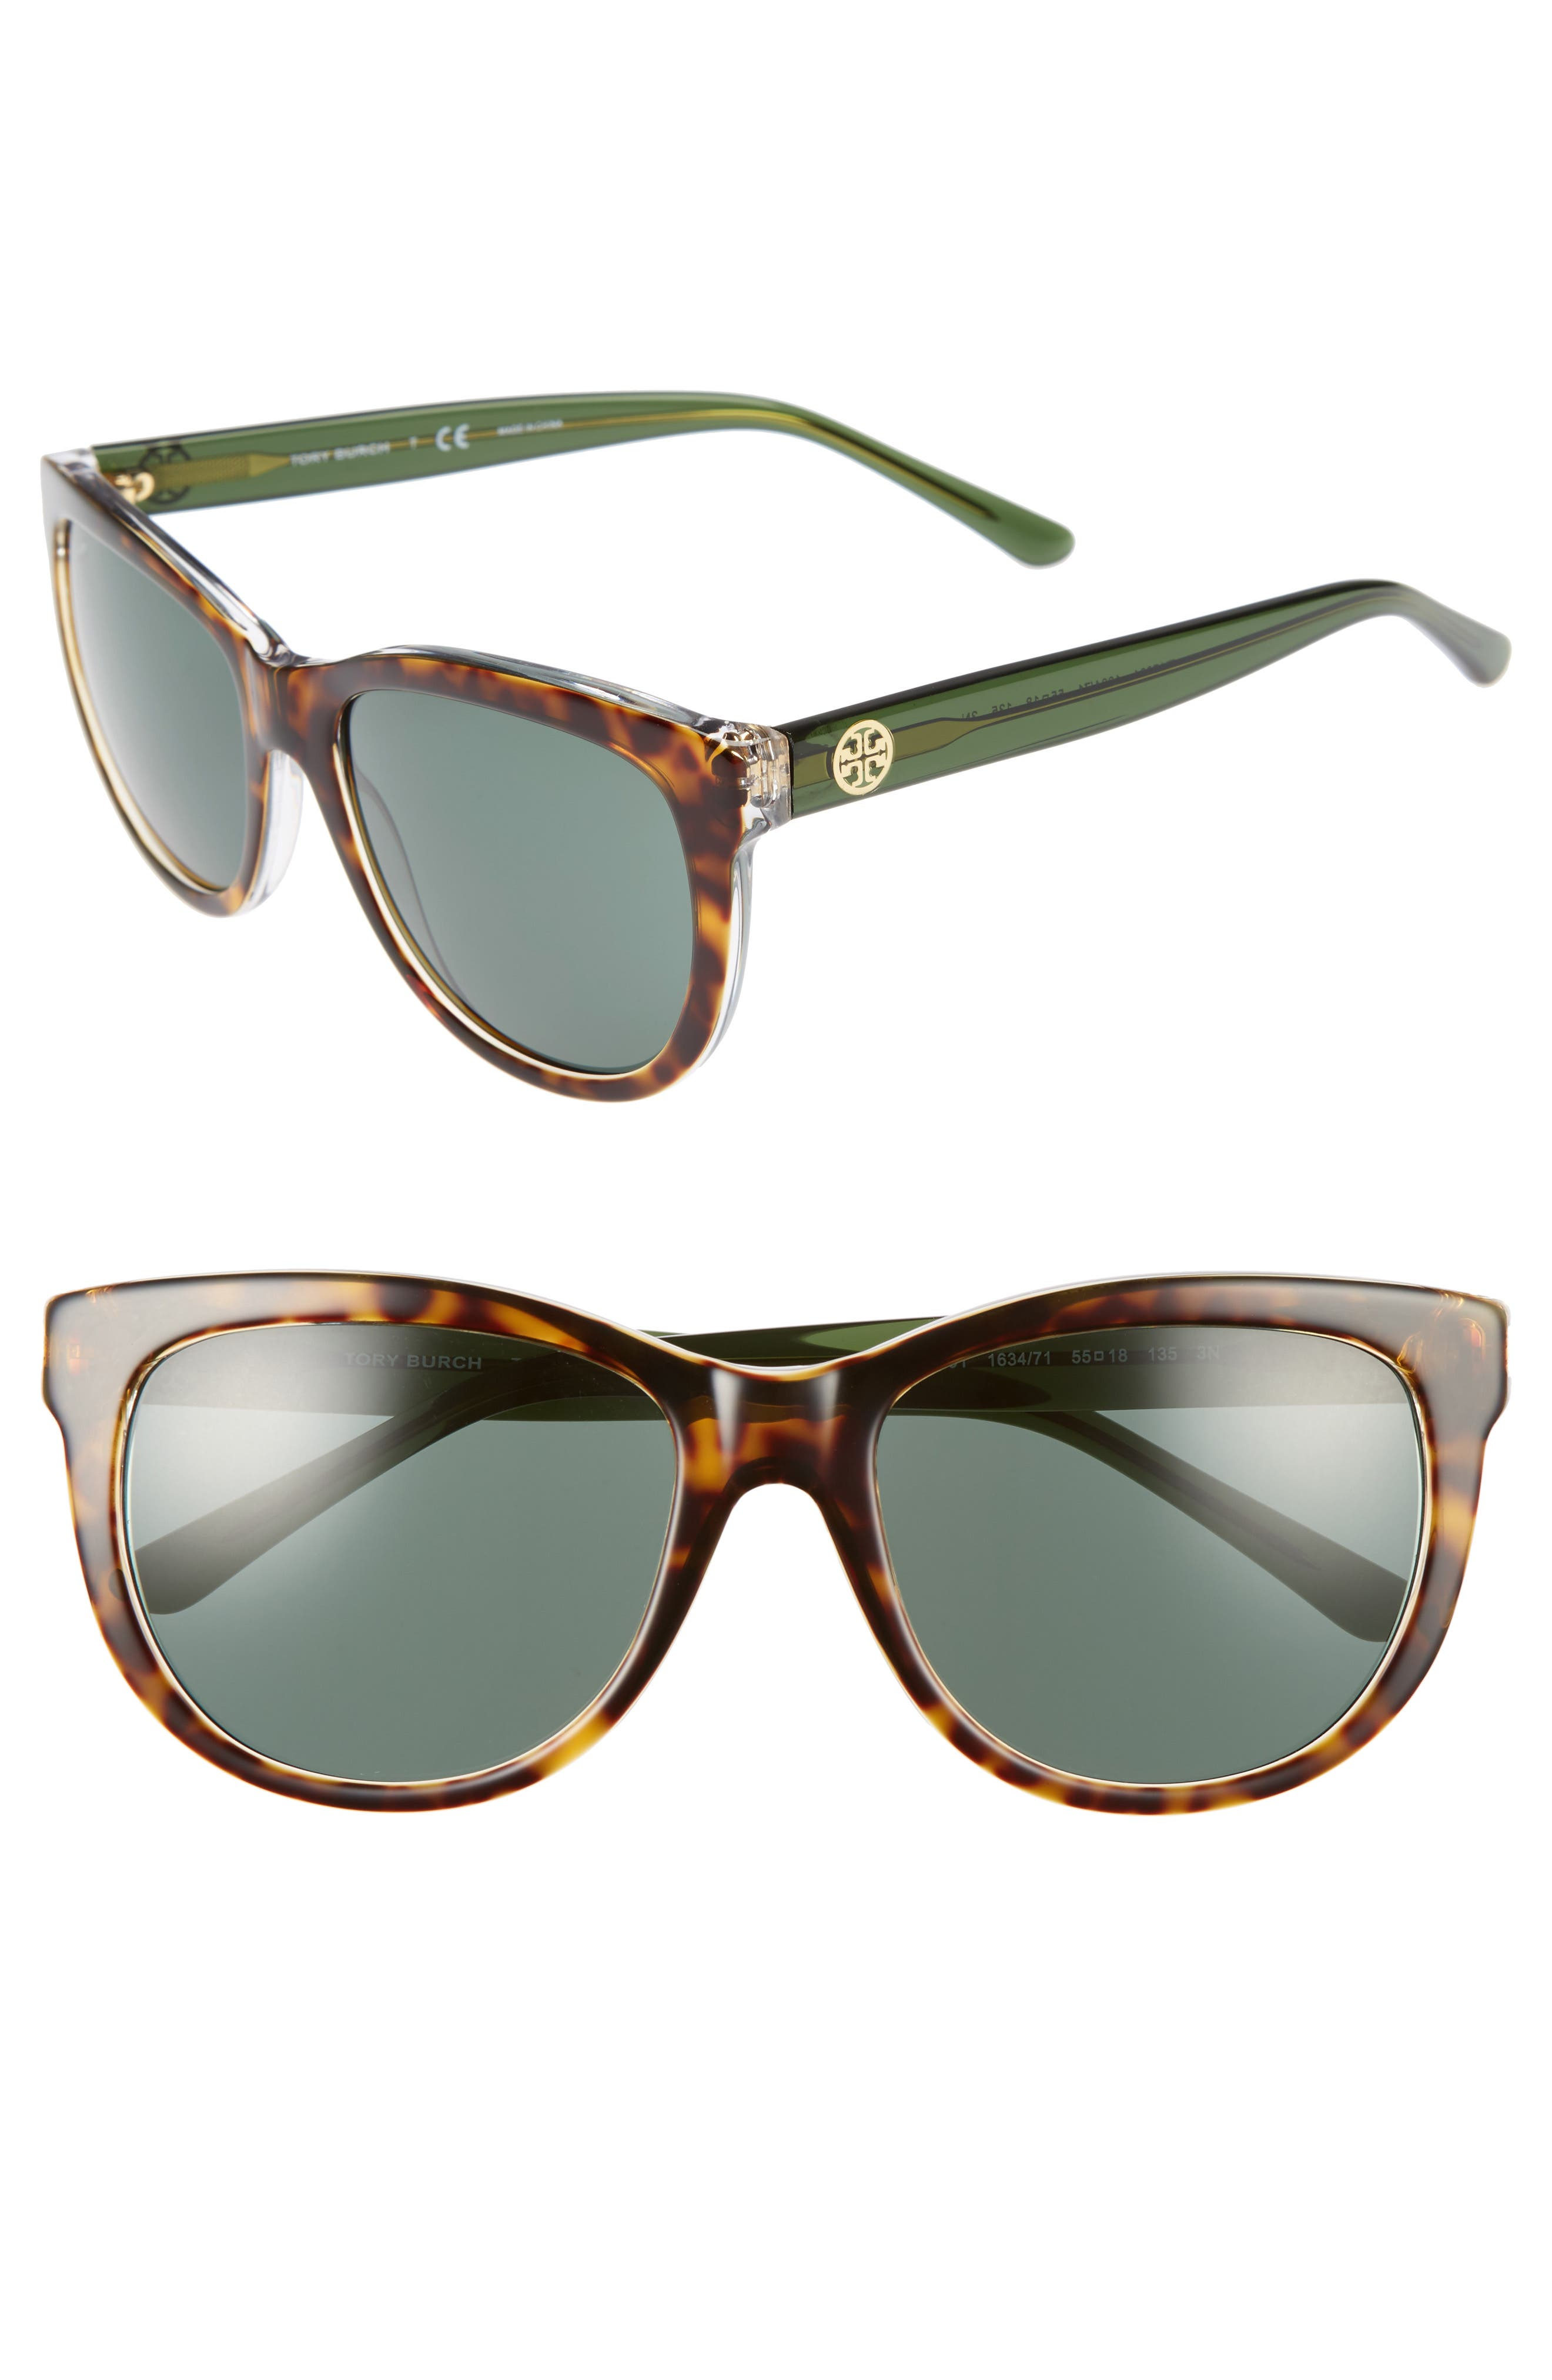 55mm Sunglasses,                             Alternate thumbnail 2, color,                             300